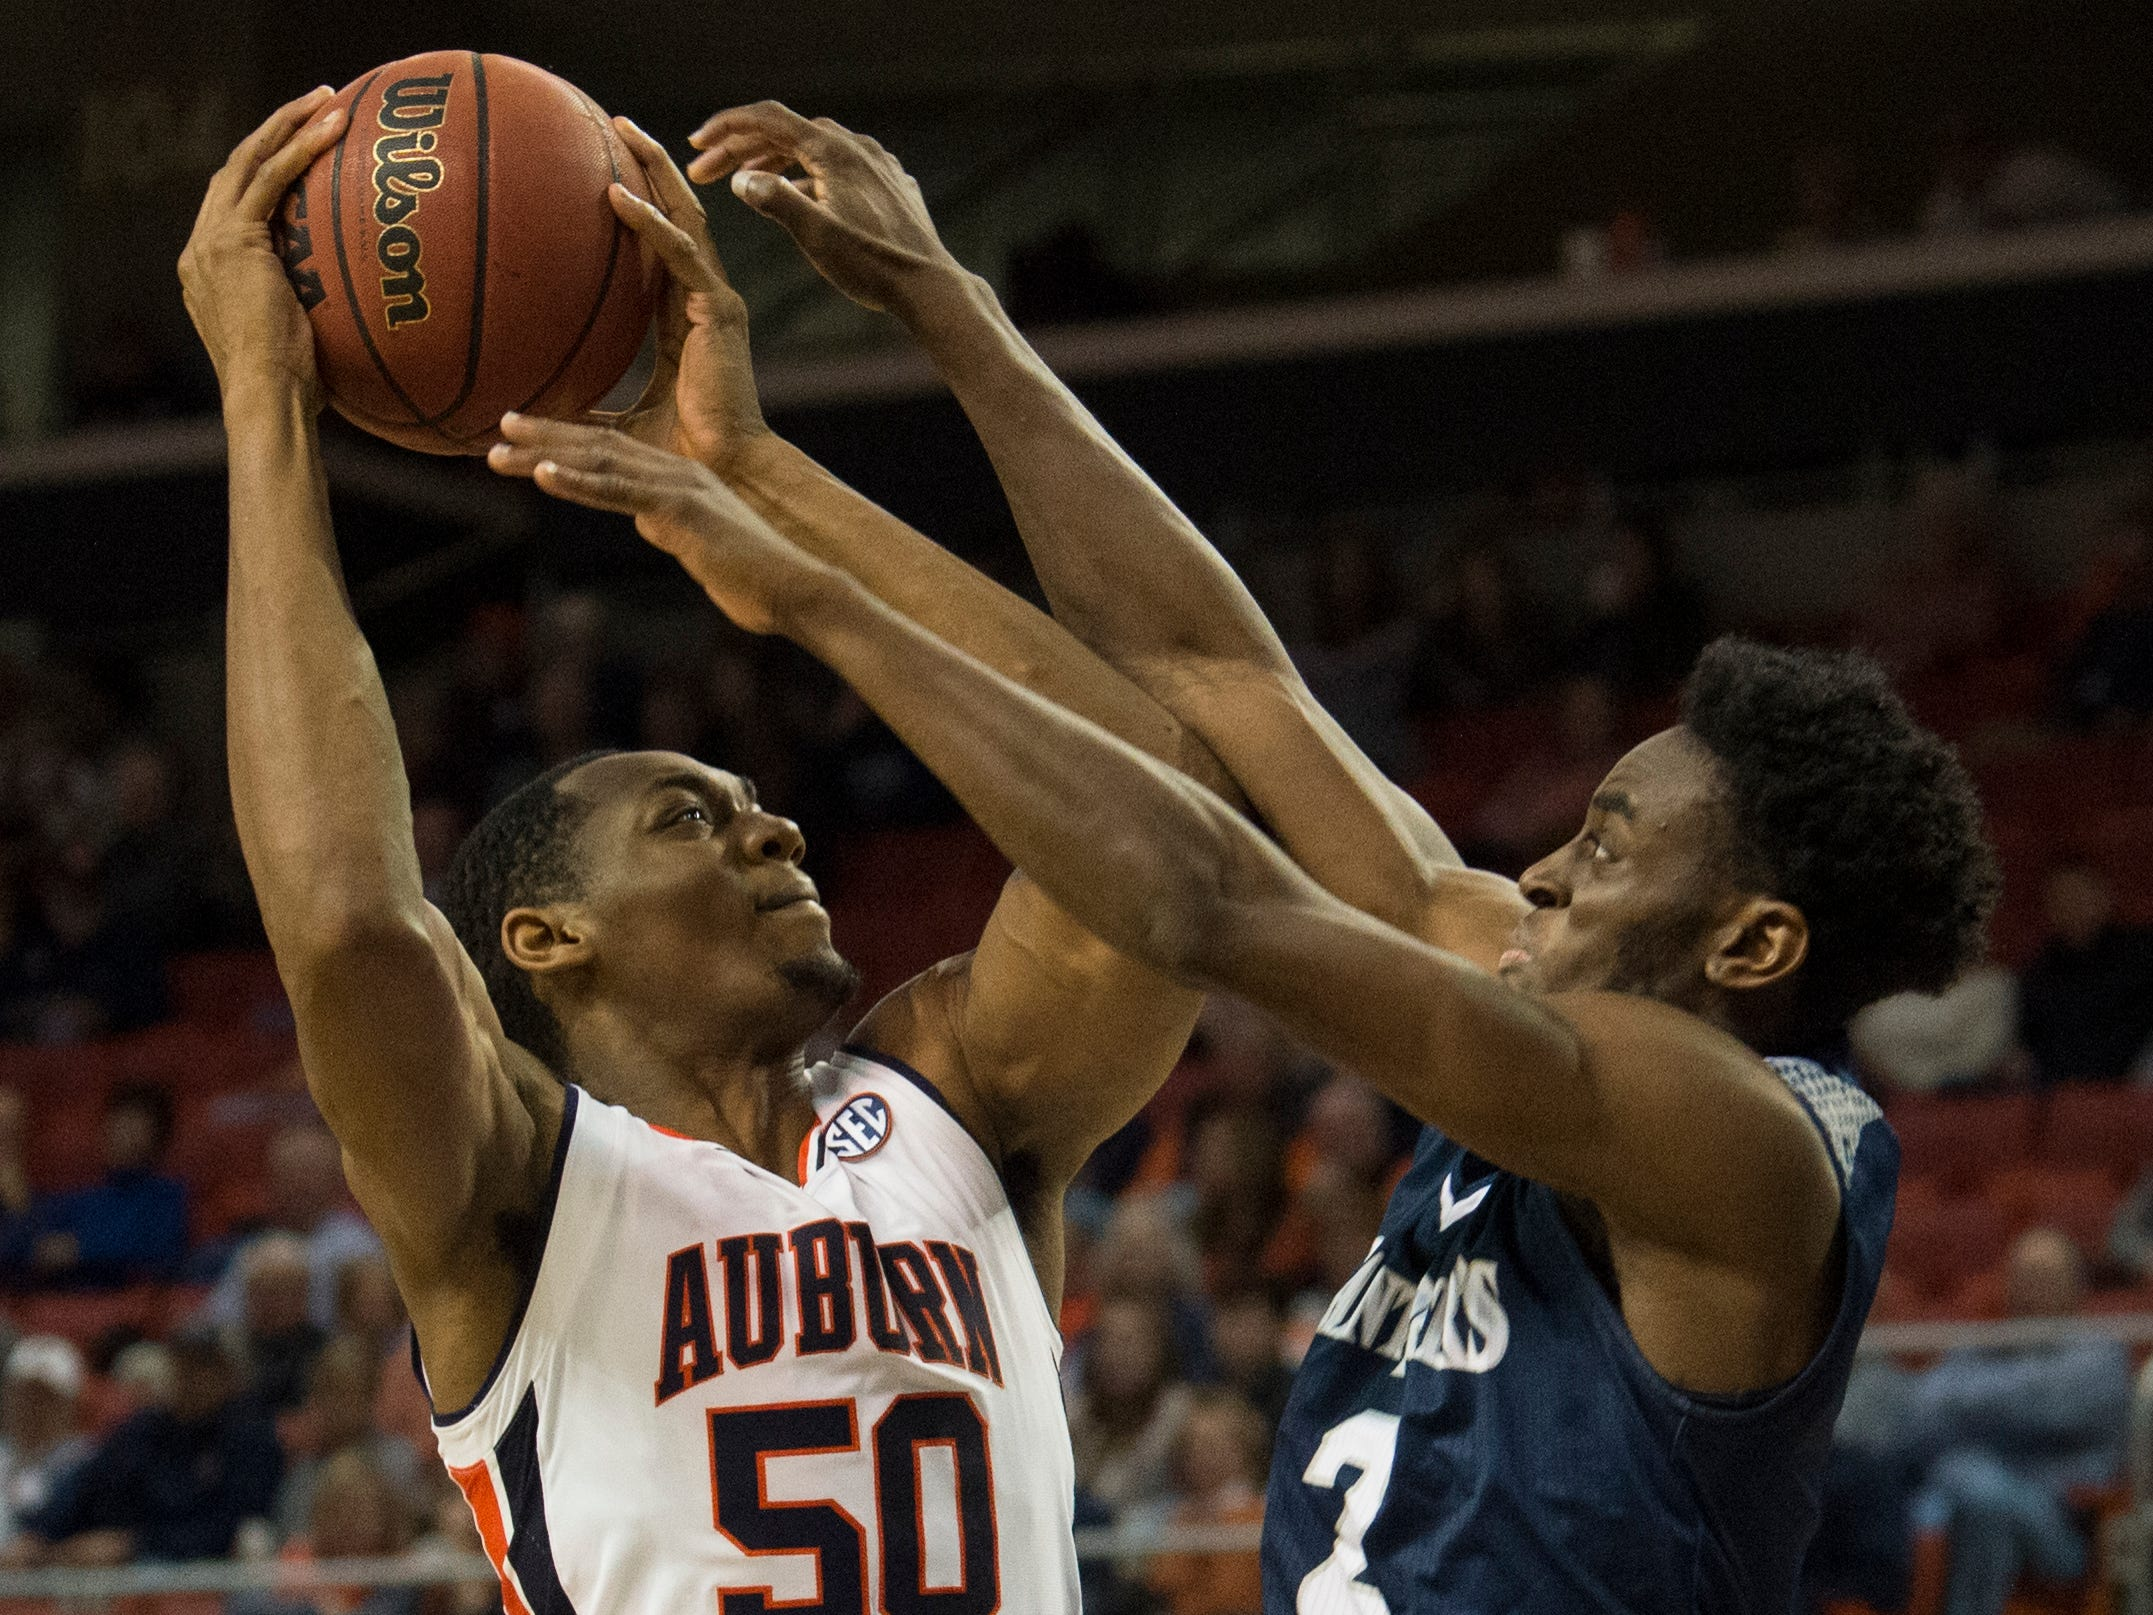 Auburn center Austin Wiley (50) goes up for a layup over Saint Peter's guard Klay Brown (2) at Auburn Arena in Auburn, Ala., on Wednesday, Nov. 28, 2018. Auburn defeated Saint Peter's 99-49.